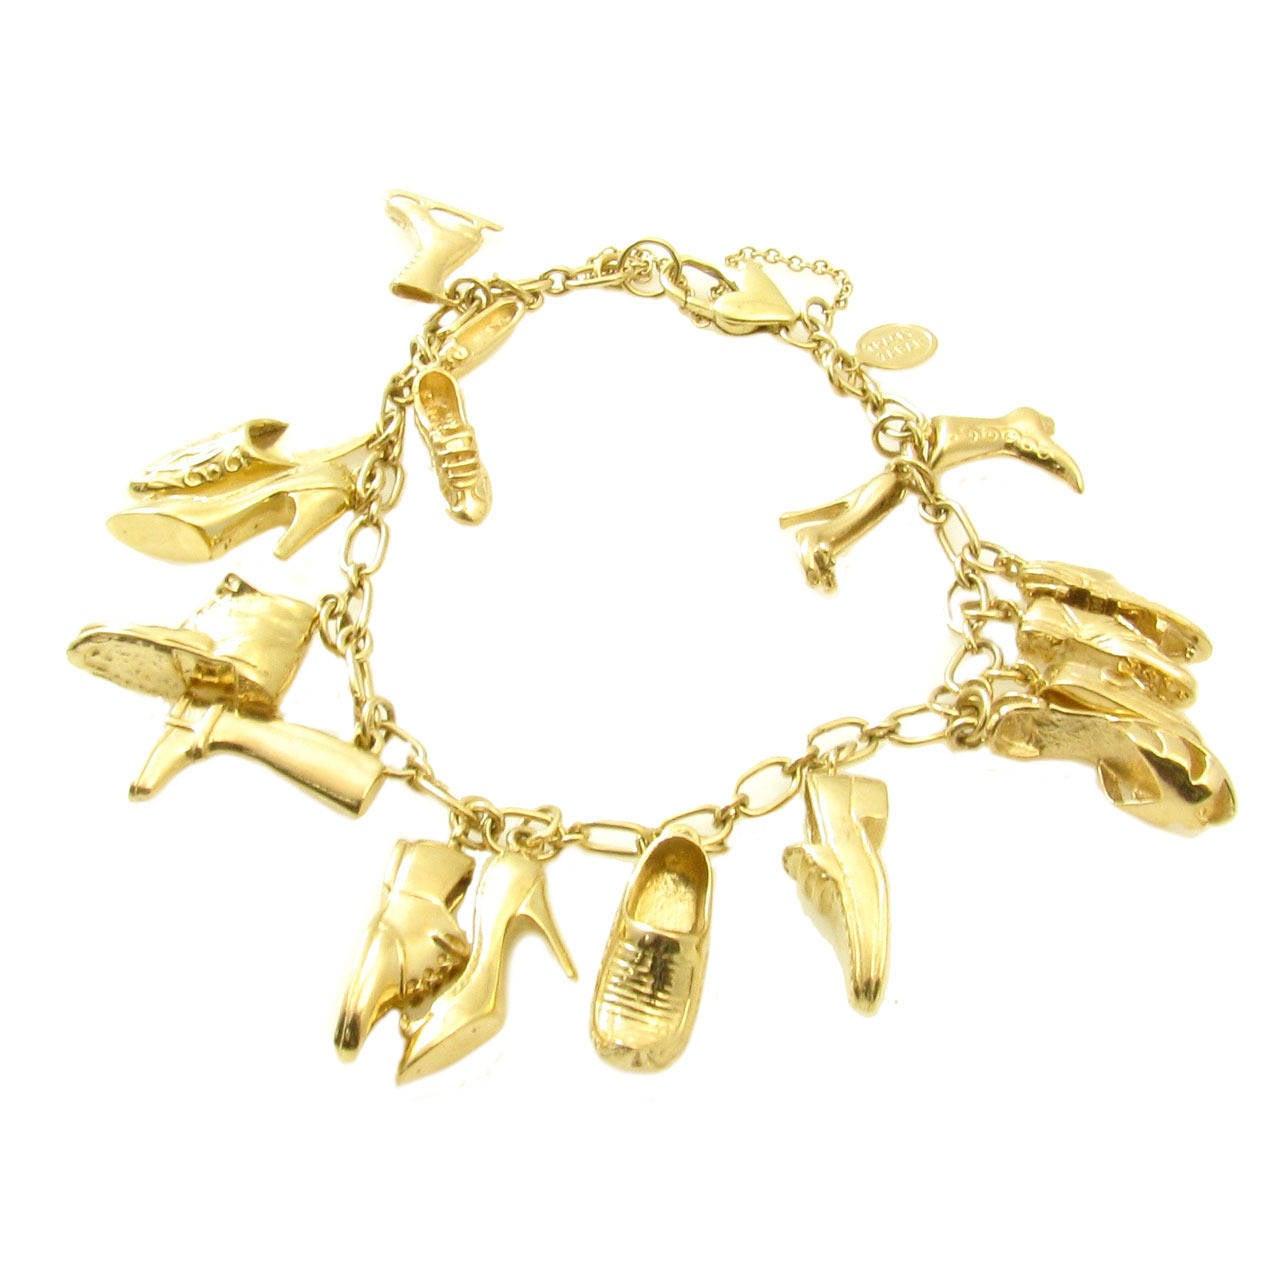 Shoe Charm Bracelet: Tracey Zabar Gold Shoe Charm Bracelet. At 1stdibs